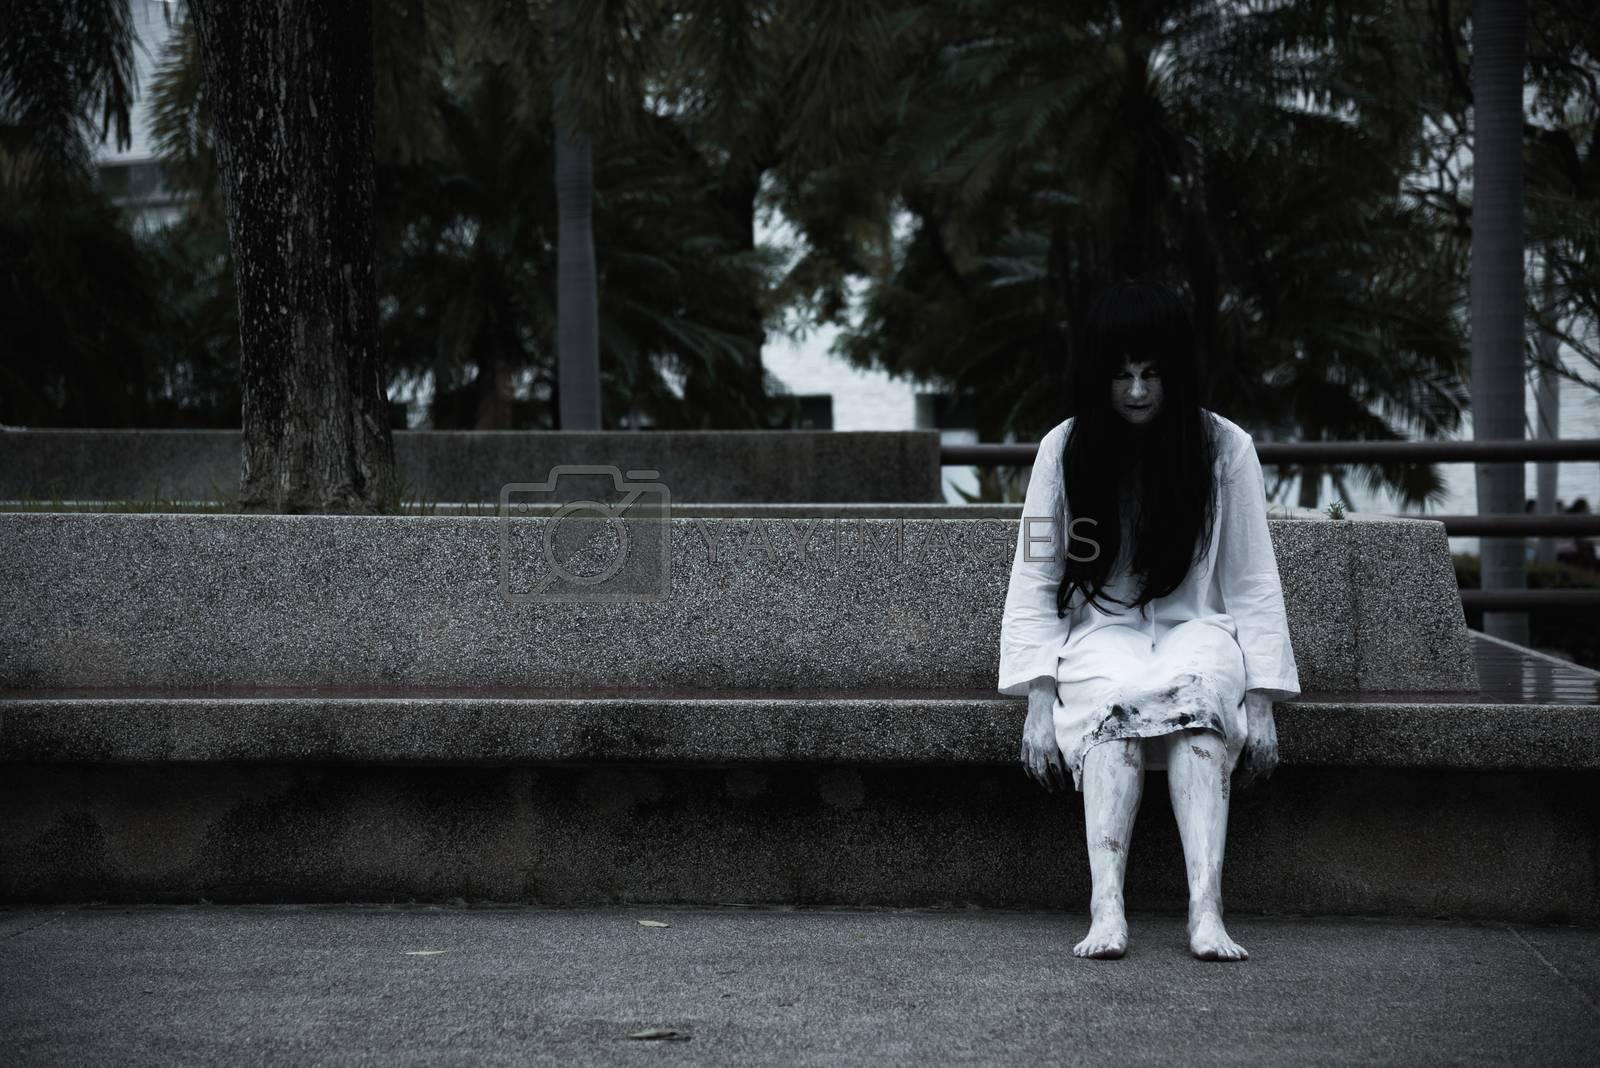 Horror woman ghost creepy sitting under the tree on garden, by Sorapop